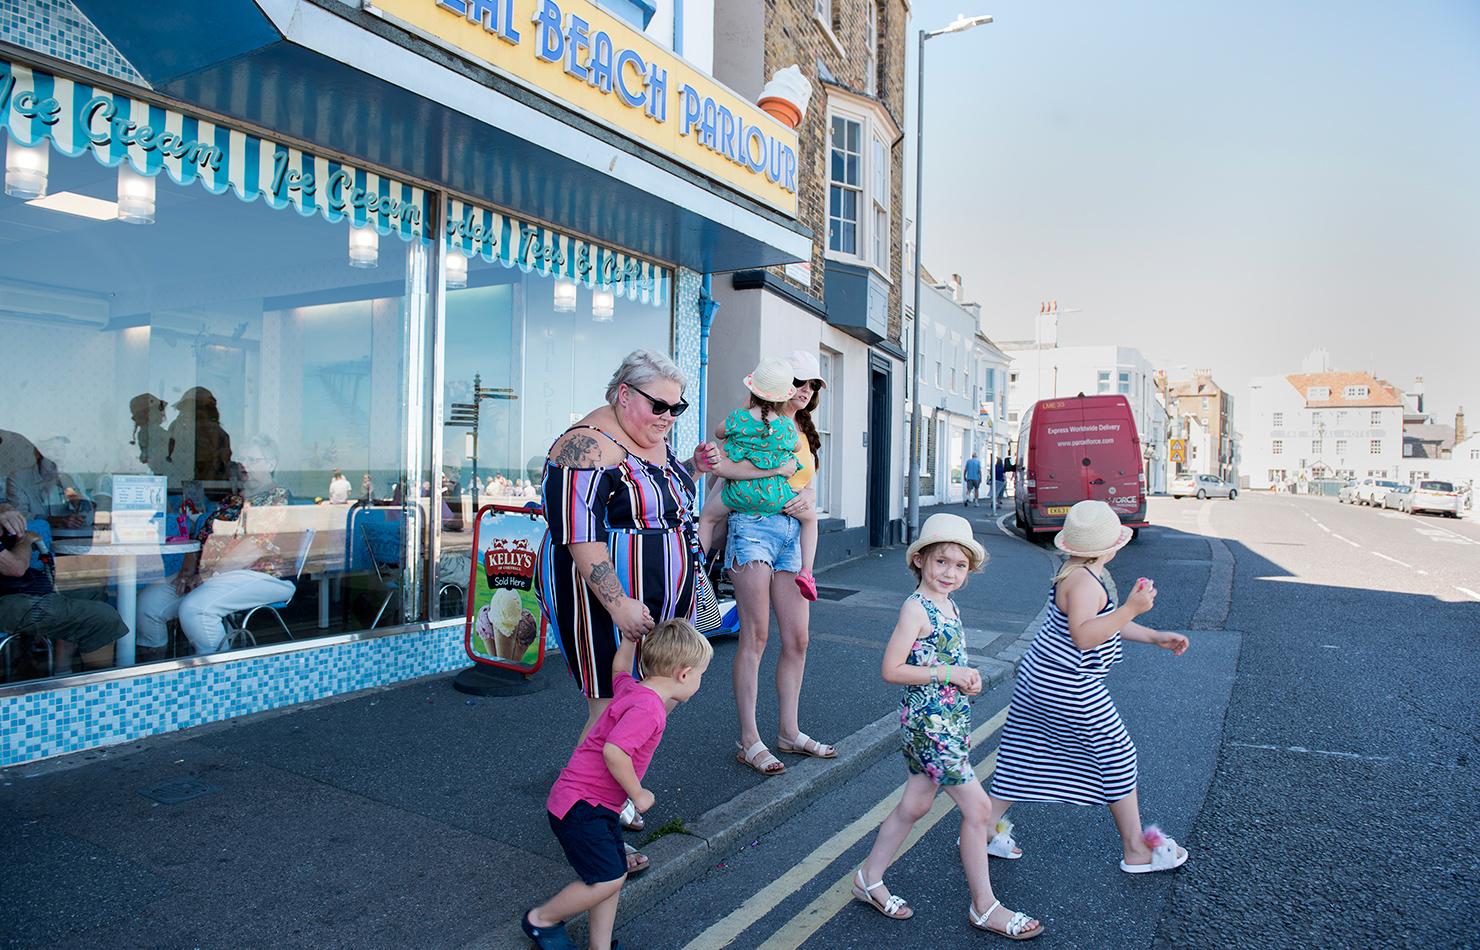 UK deal ice cream parlour documentary photography